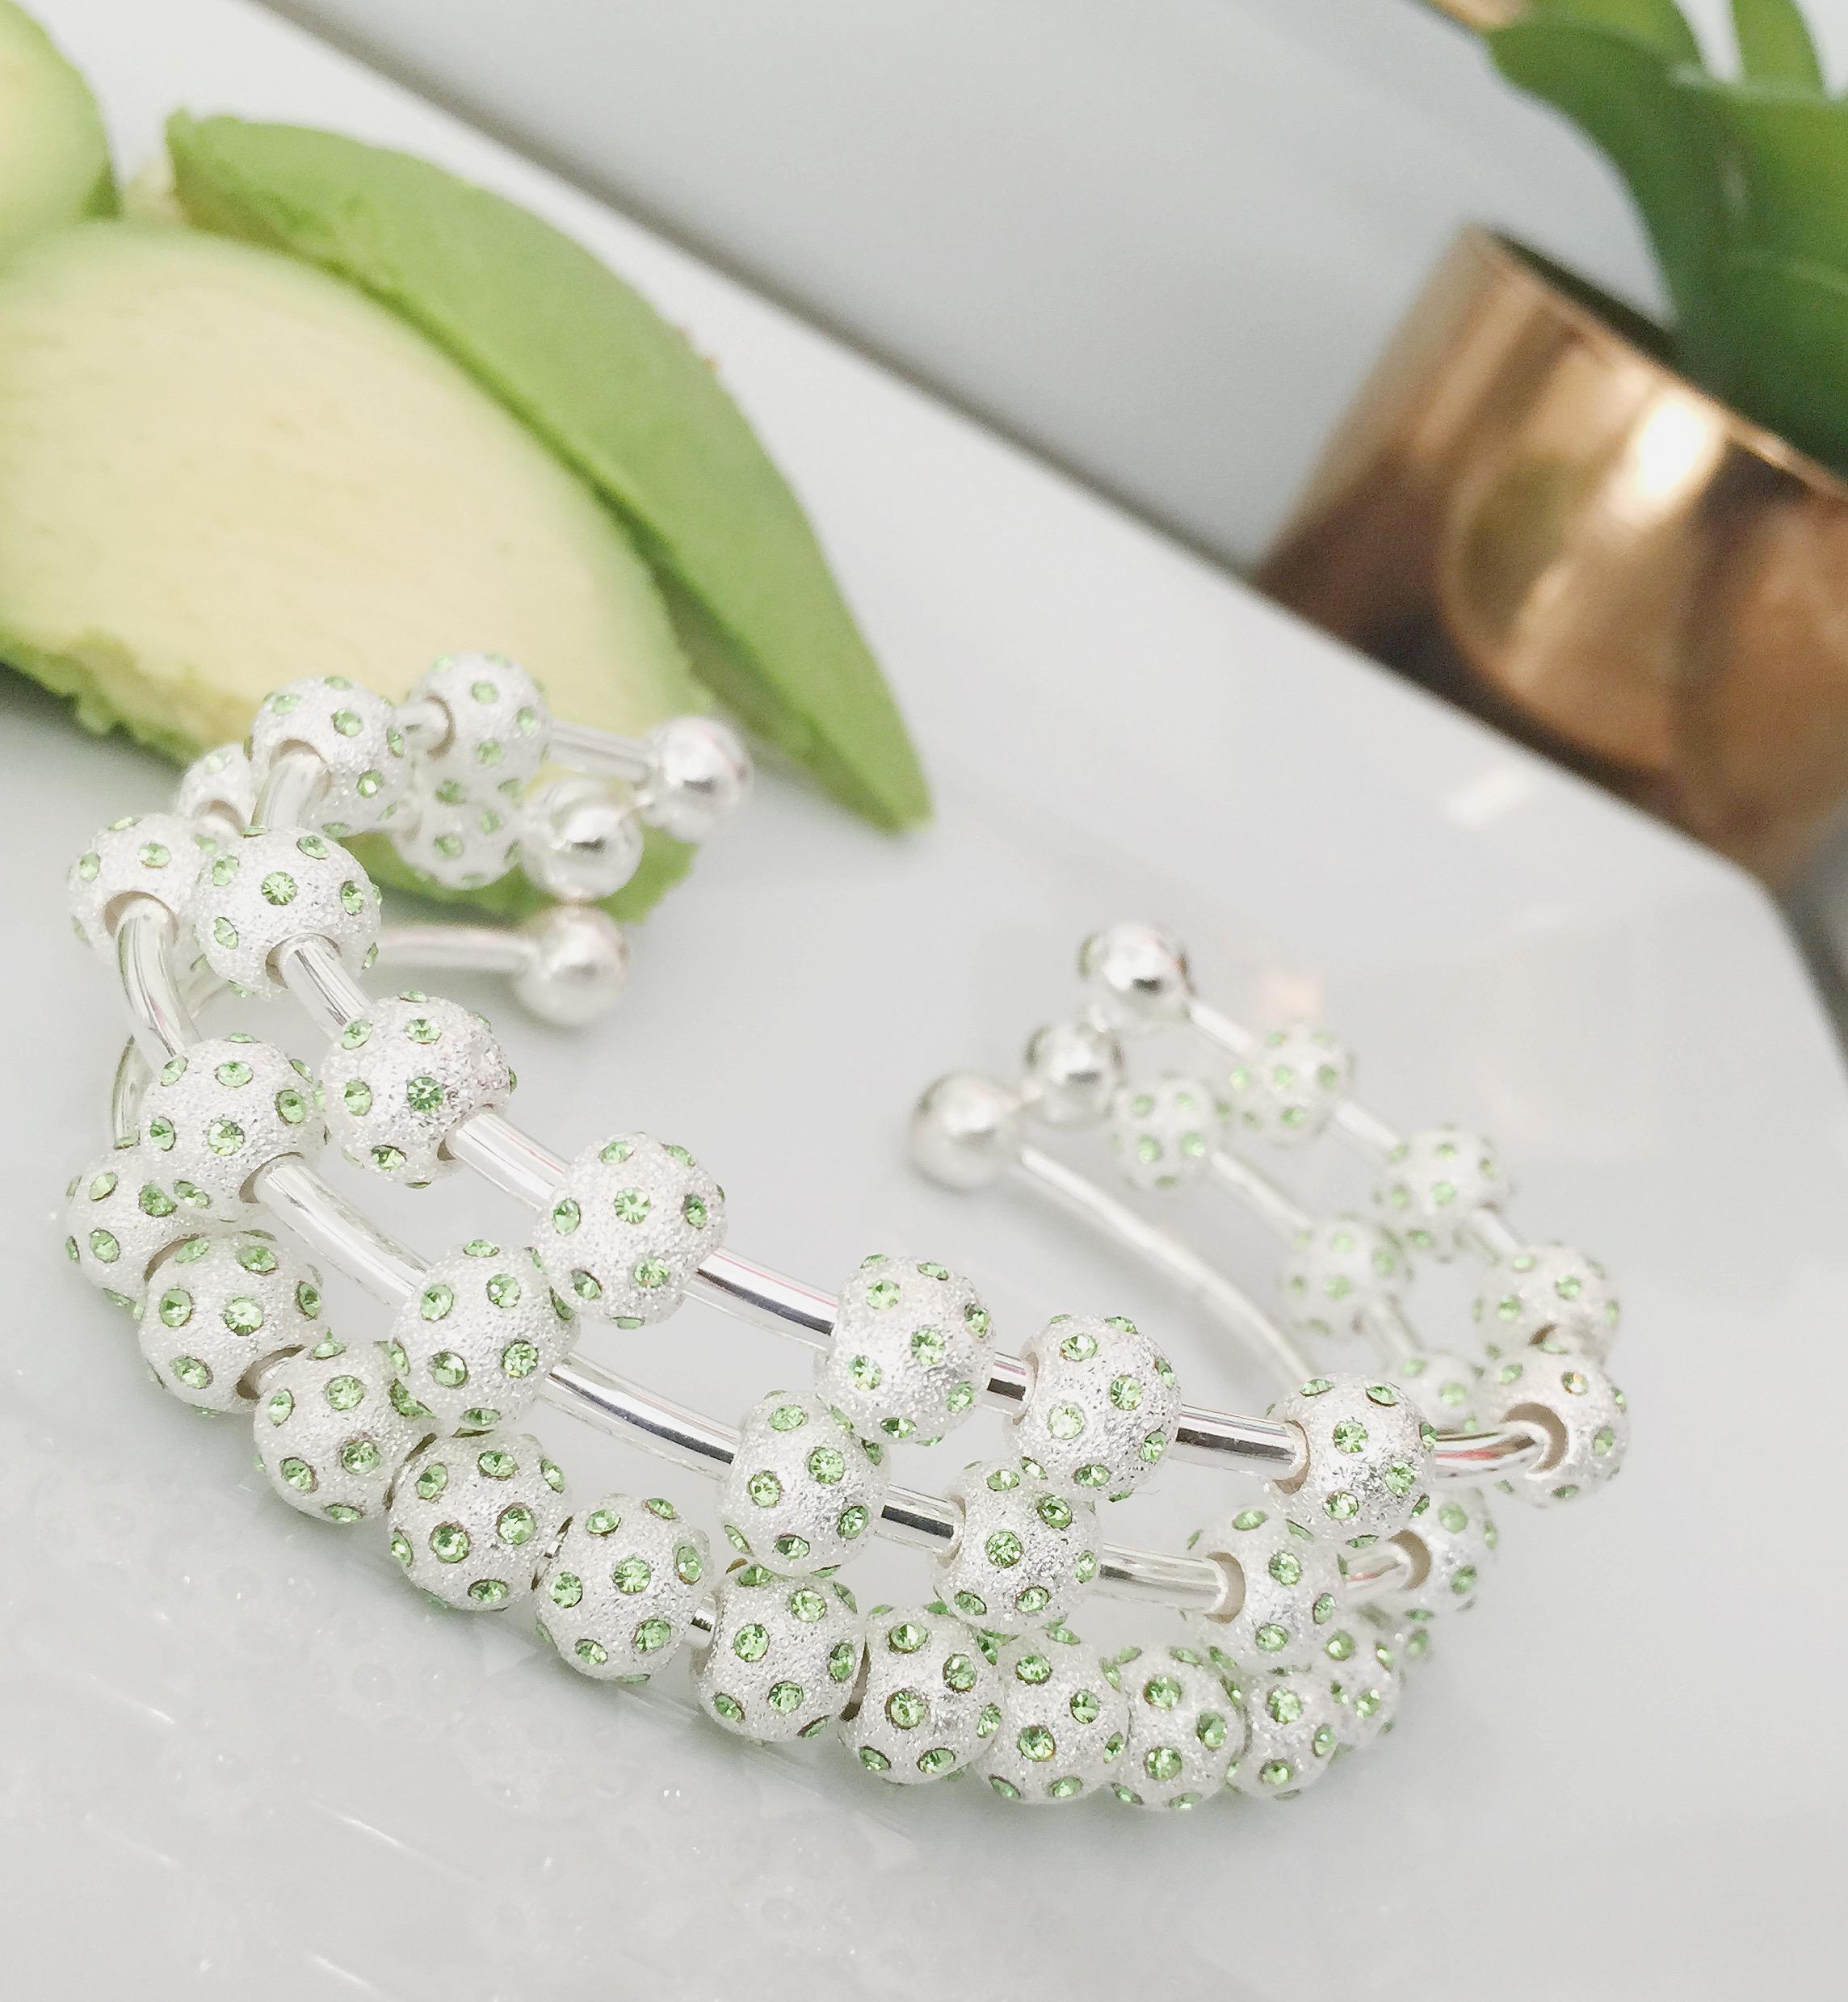 Introducing Watercolor Crystal Journal Bracelets